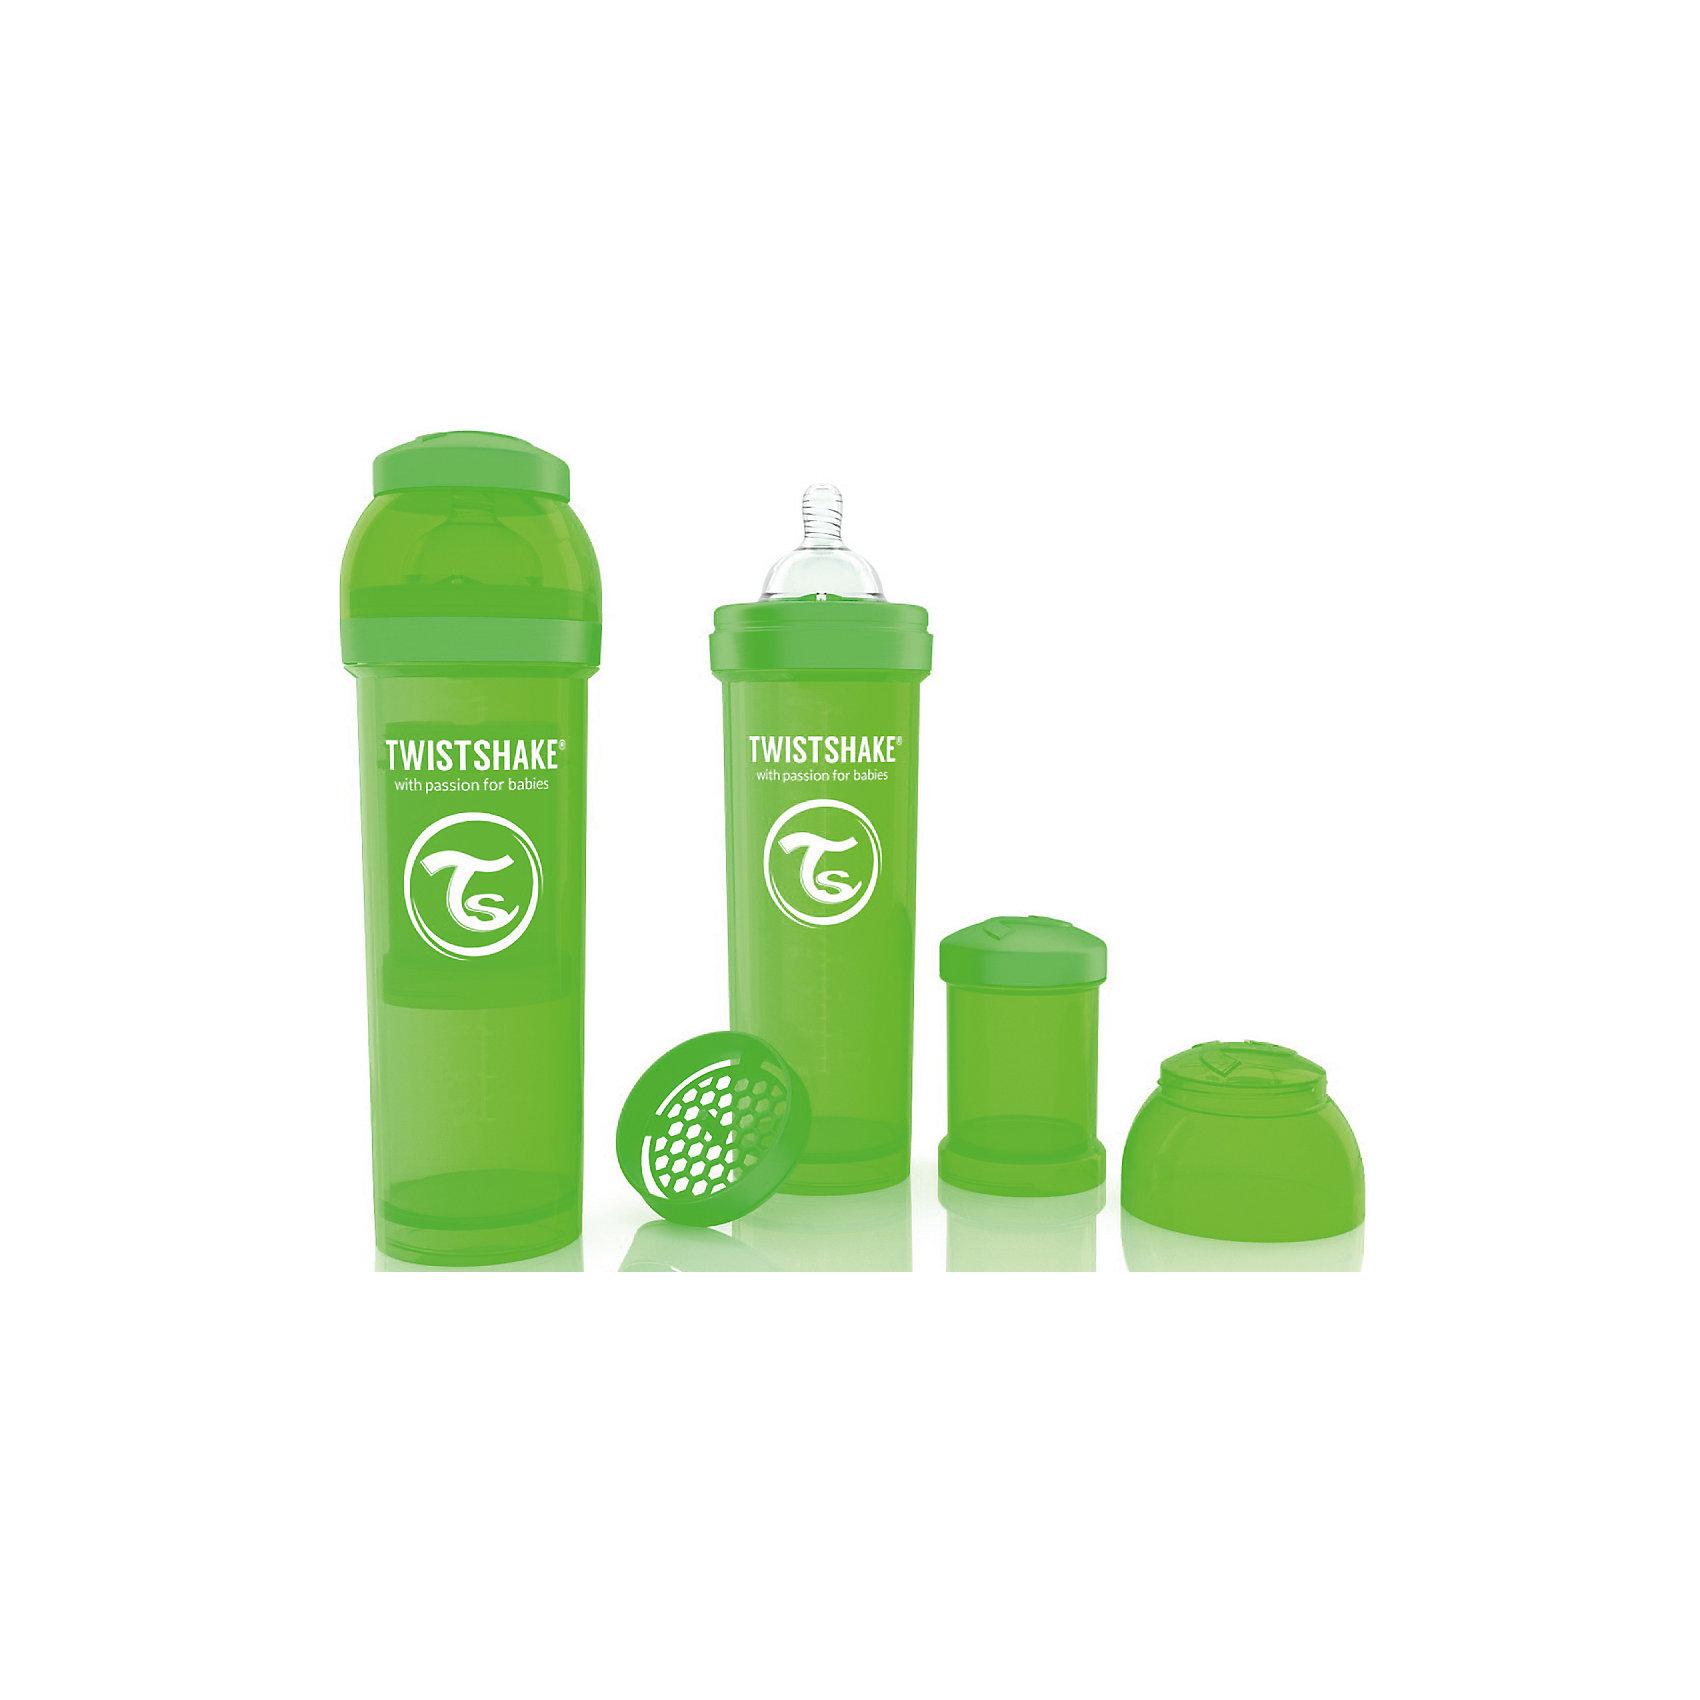 Twistshake Антиколиковая бутылочка 330 мл., Twistshake, зелёный шарк 330 купить в украике